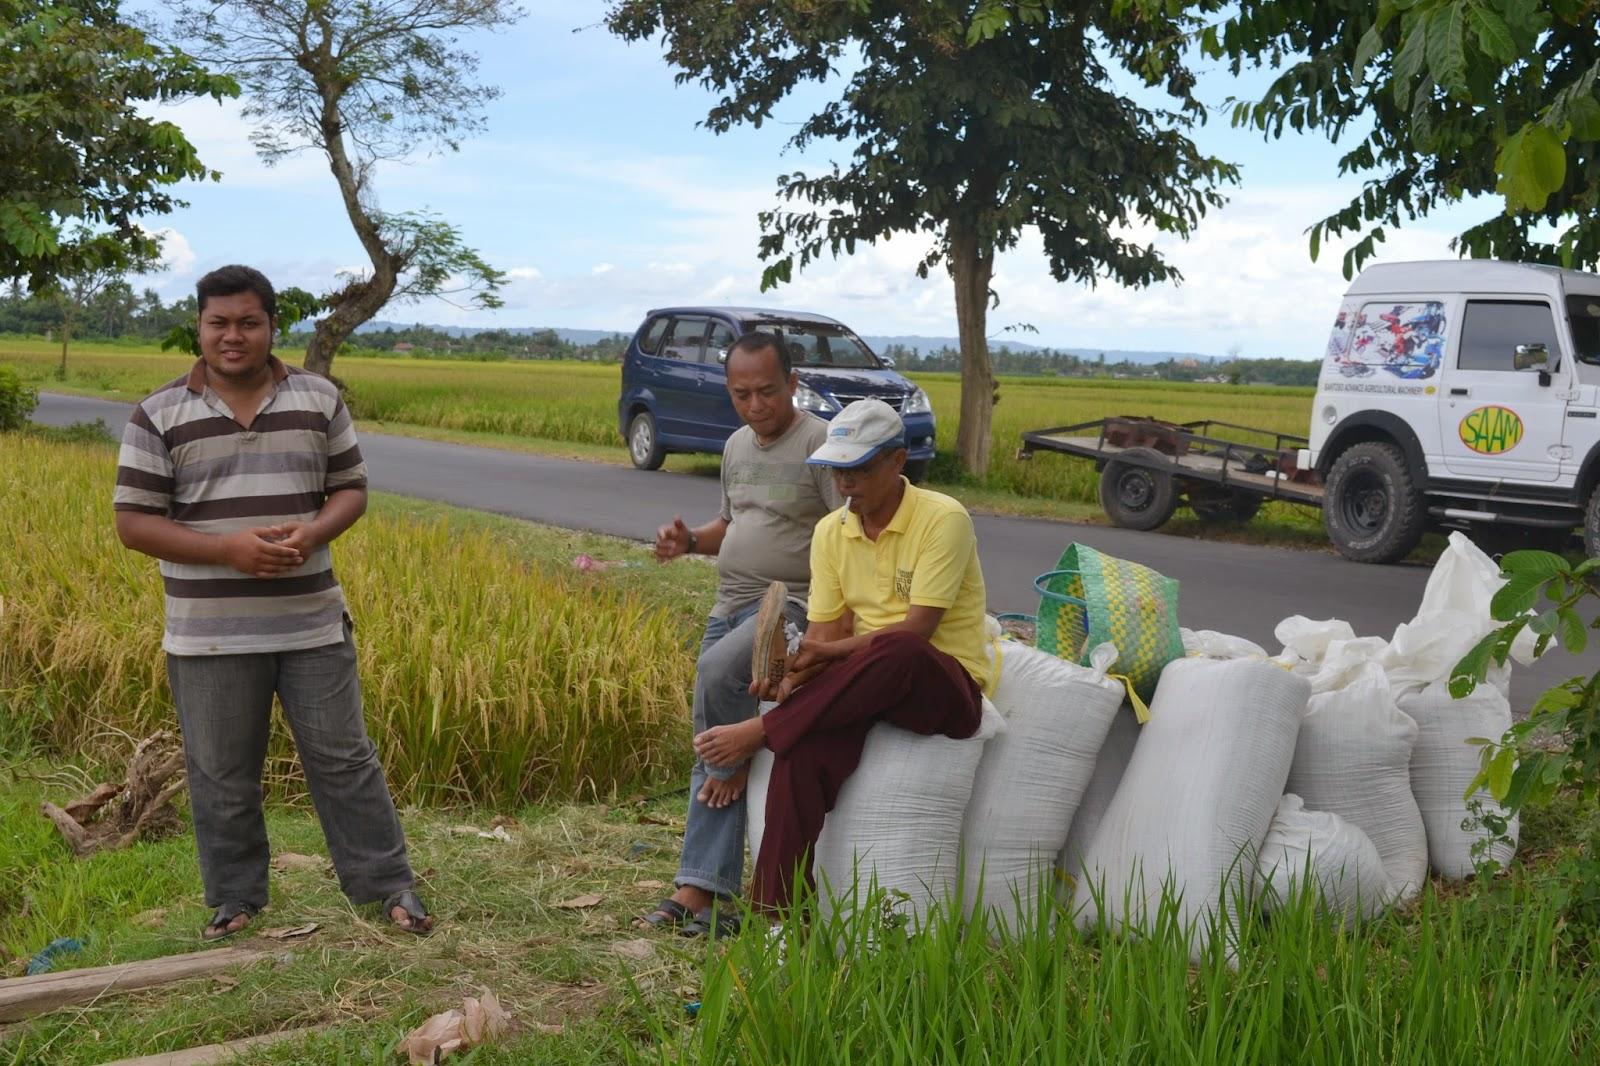 Demo Mesin Panen Padi Santoso Advance Agricultural Machinery Paket Tudung 1 Pisau Dan Gearcase Saam Jalan Ahmad Yani 92 Sebelah Selatan Masjid Gladak Kembar Jember 68137 Jawa Timur Indonesia